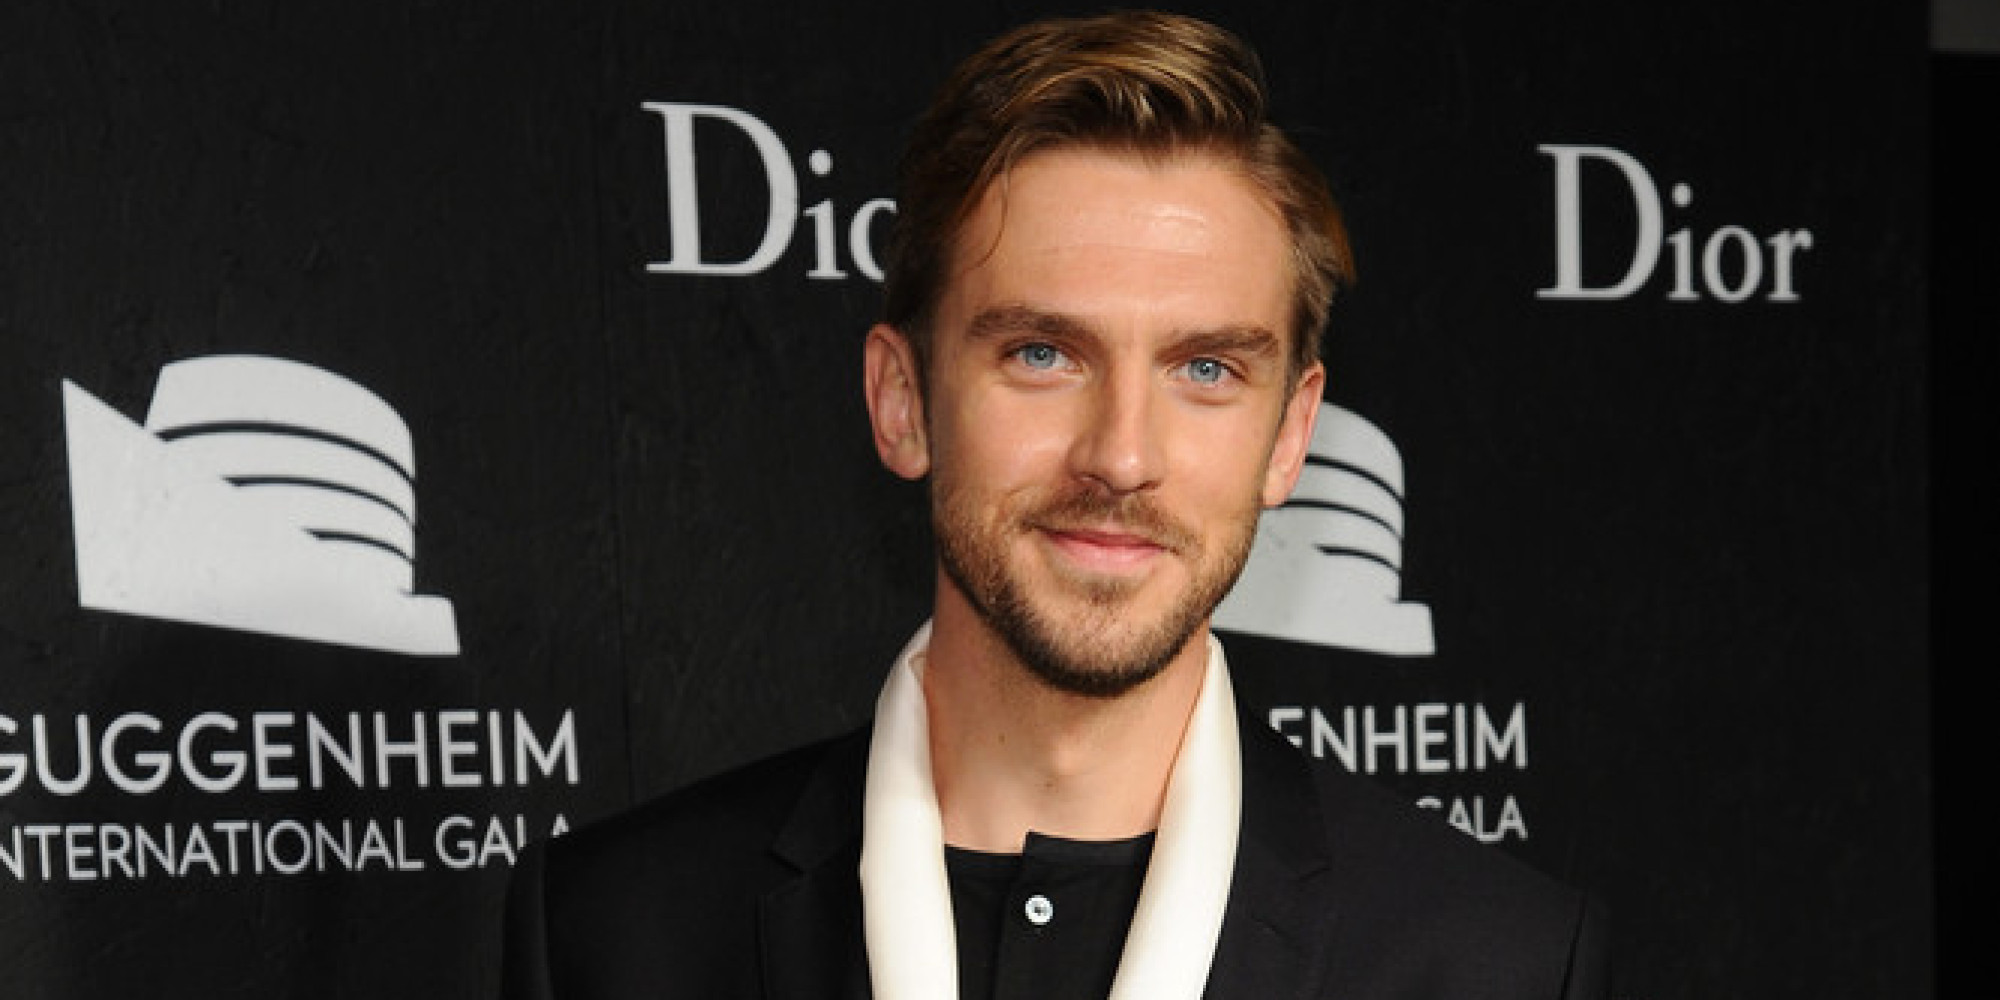 Dan Stevens Joins Luke Evans And Emma Watson In Disneys Beauty The Beast